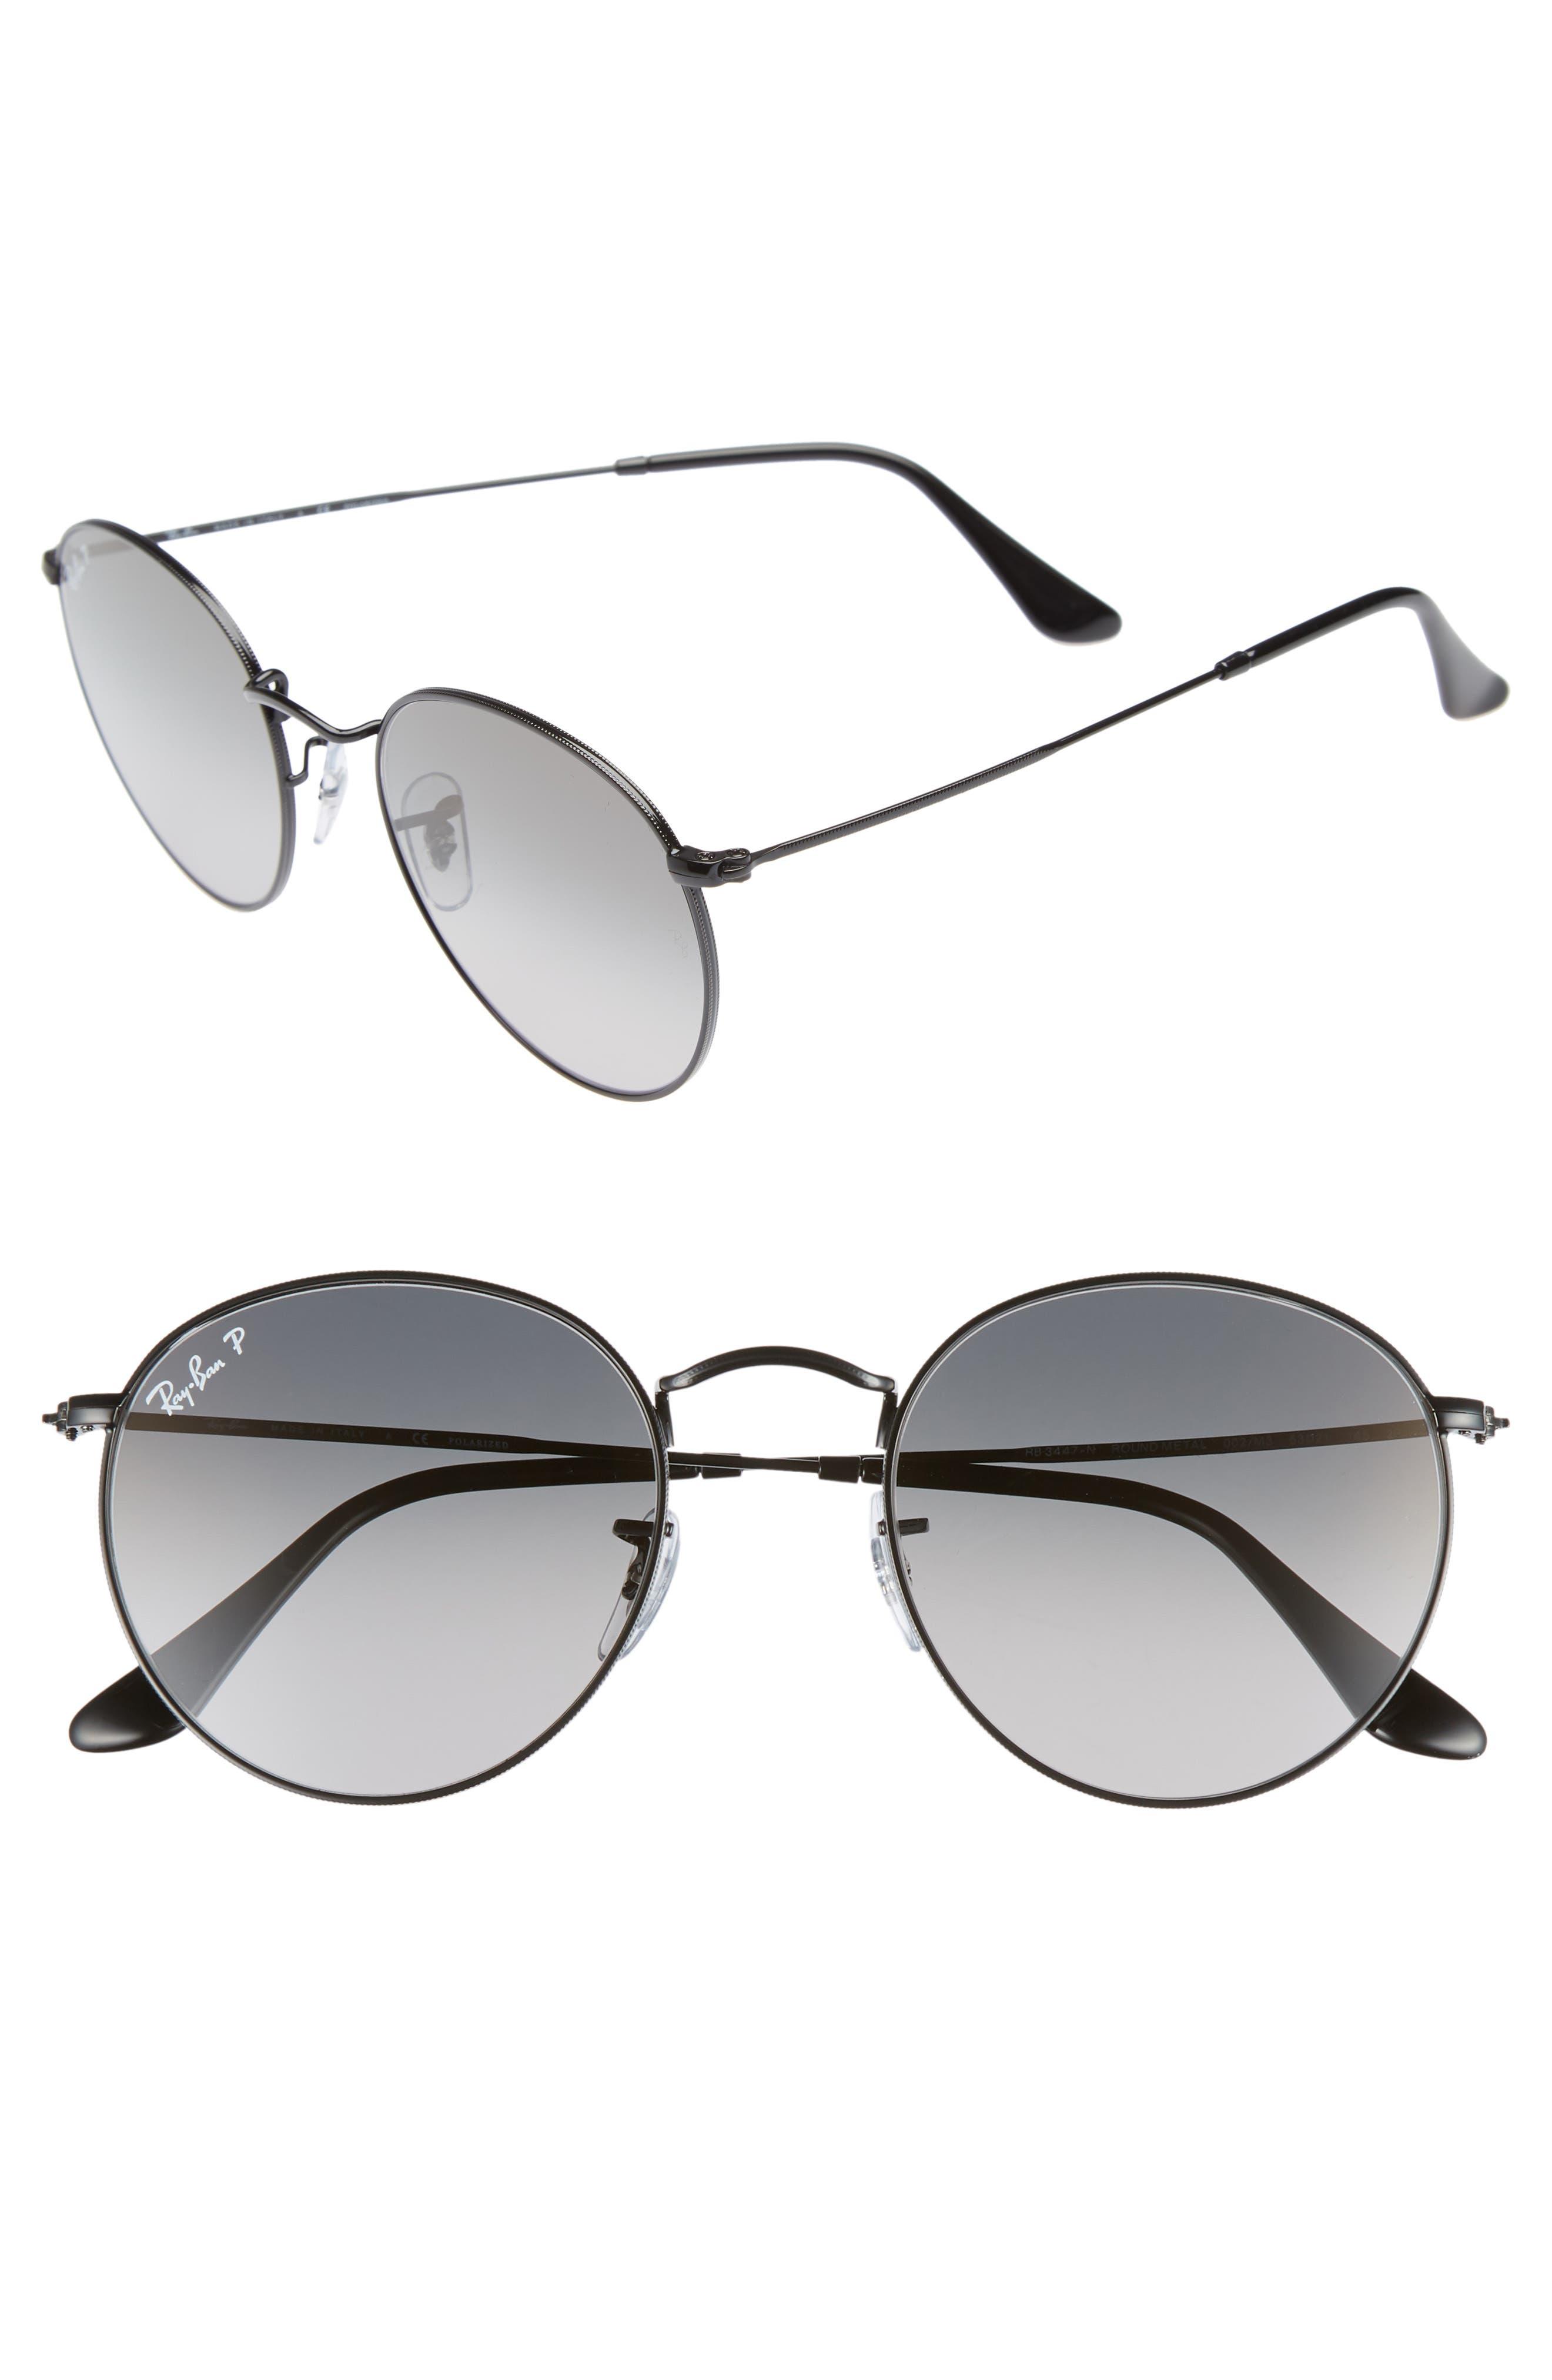 53mm Polarized Round Sunglasses,                         Main,                         color, BLACK / GREY